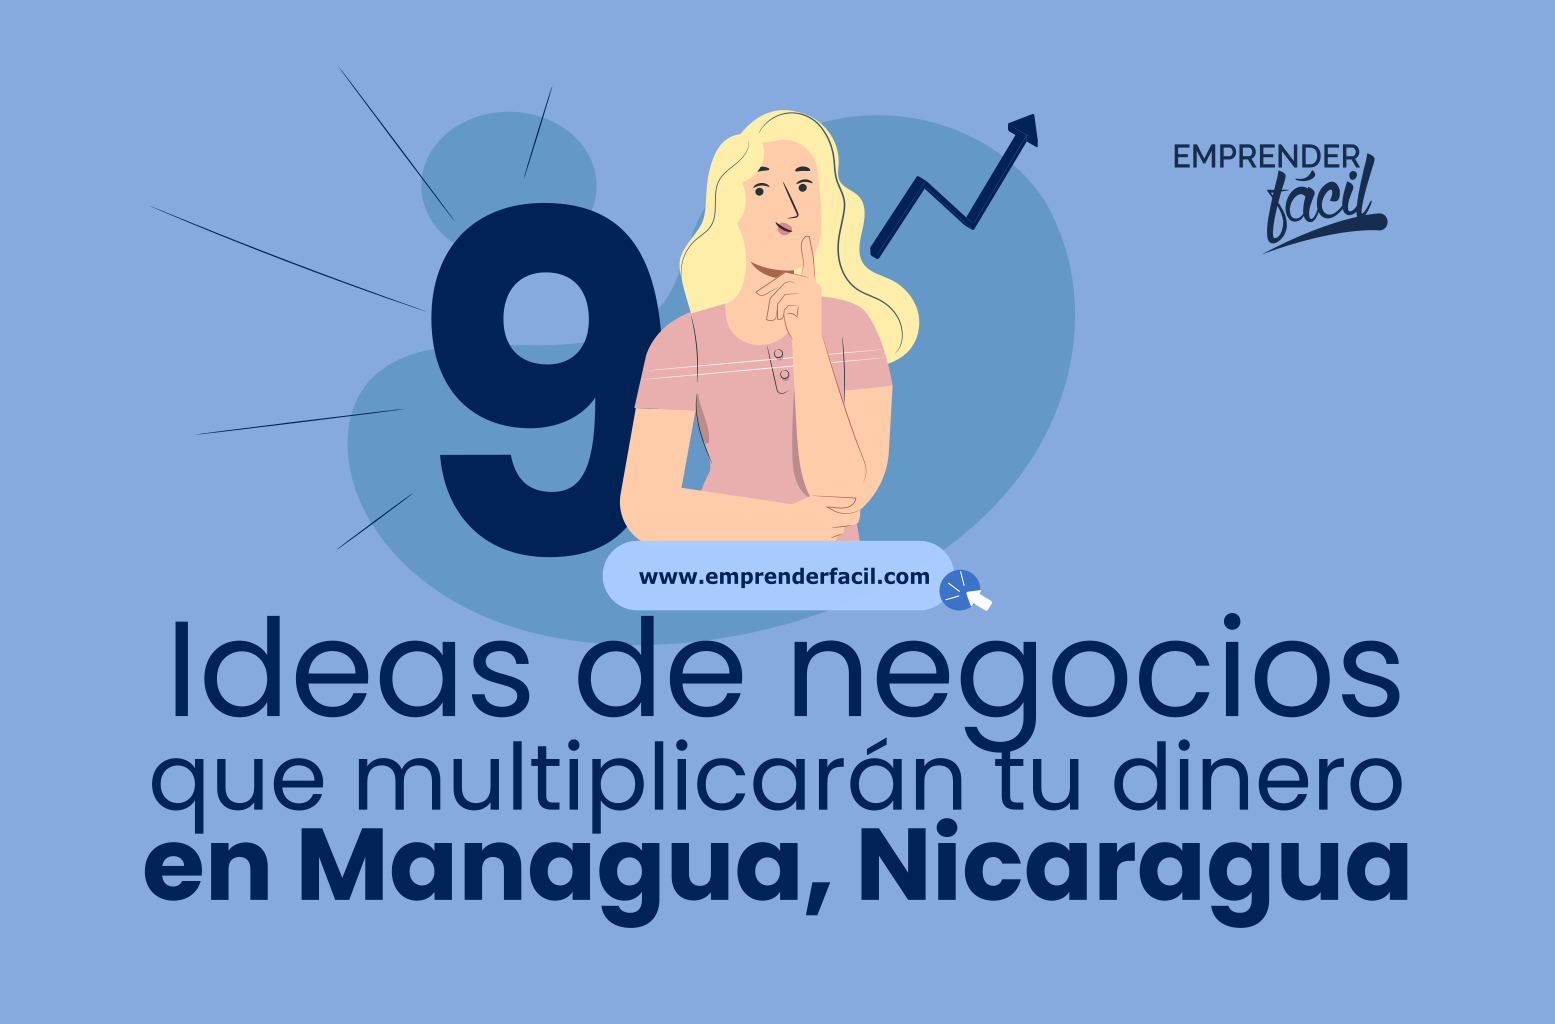 Ideas de negocios rentables en Managua, Nicaragua